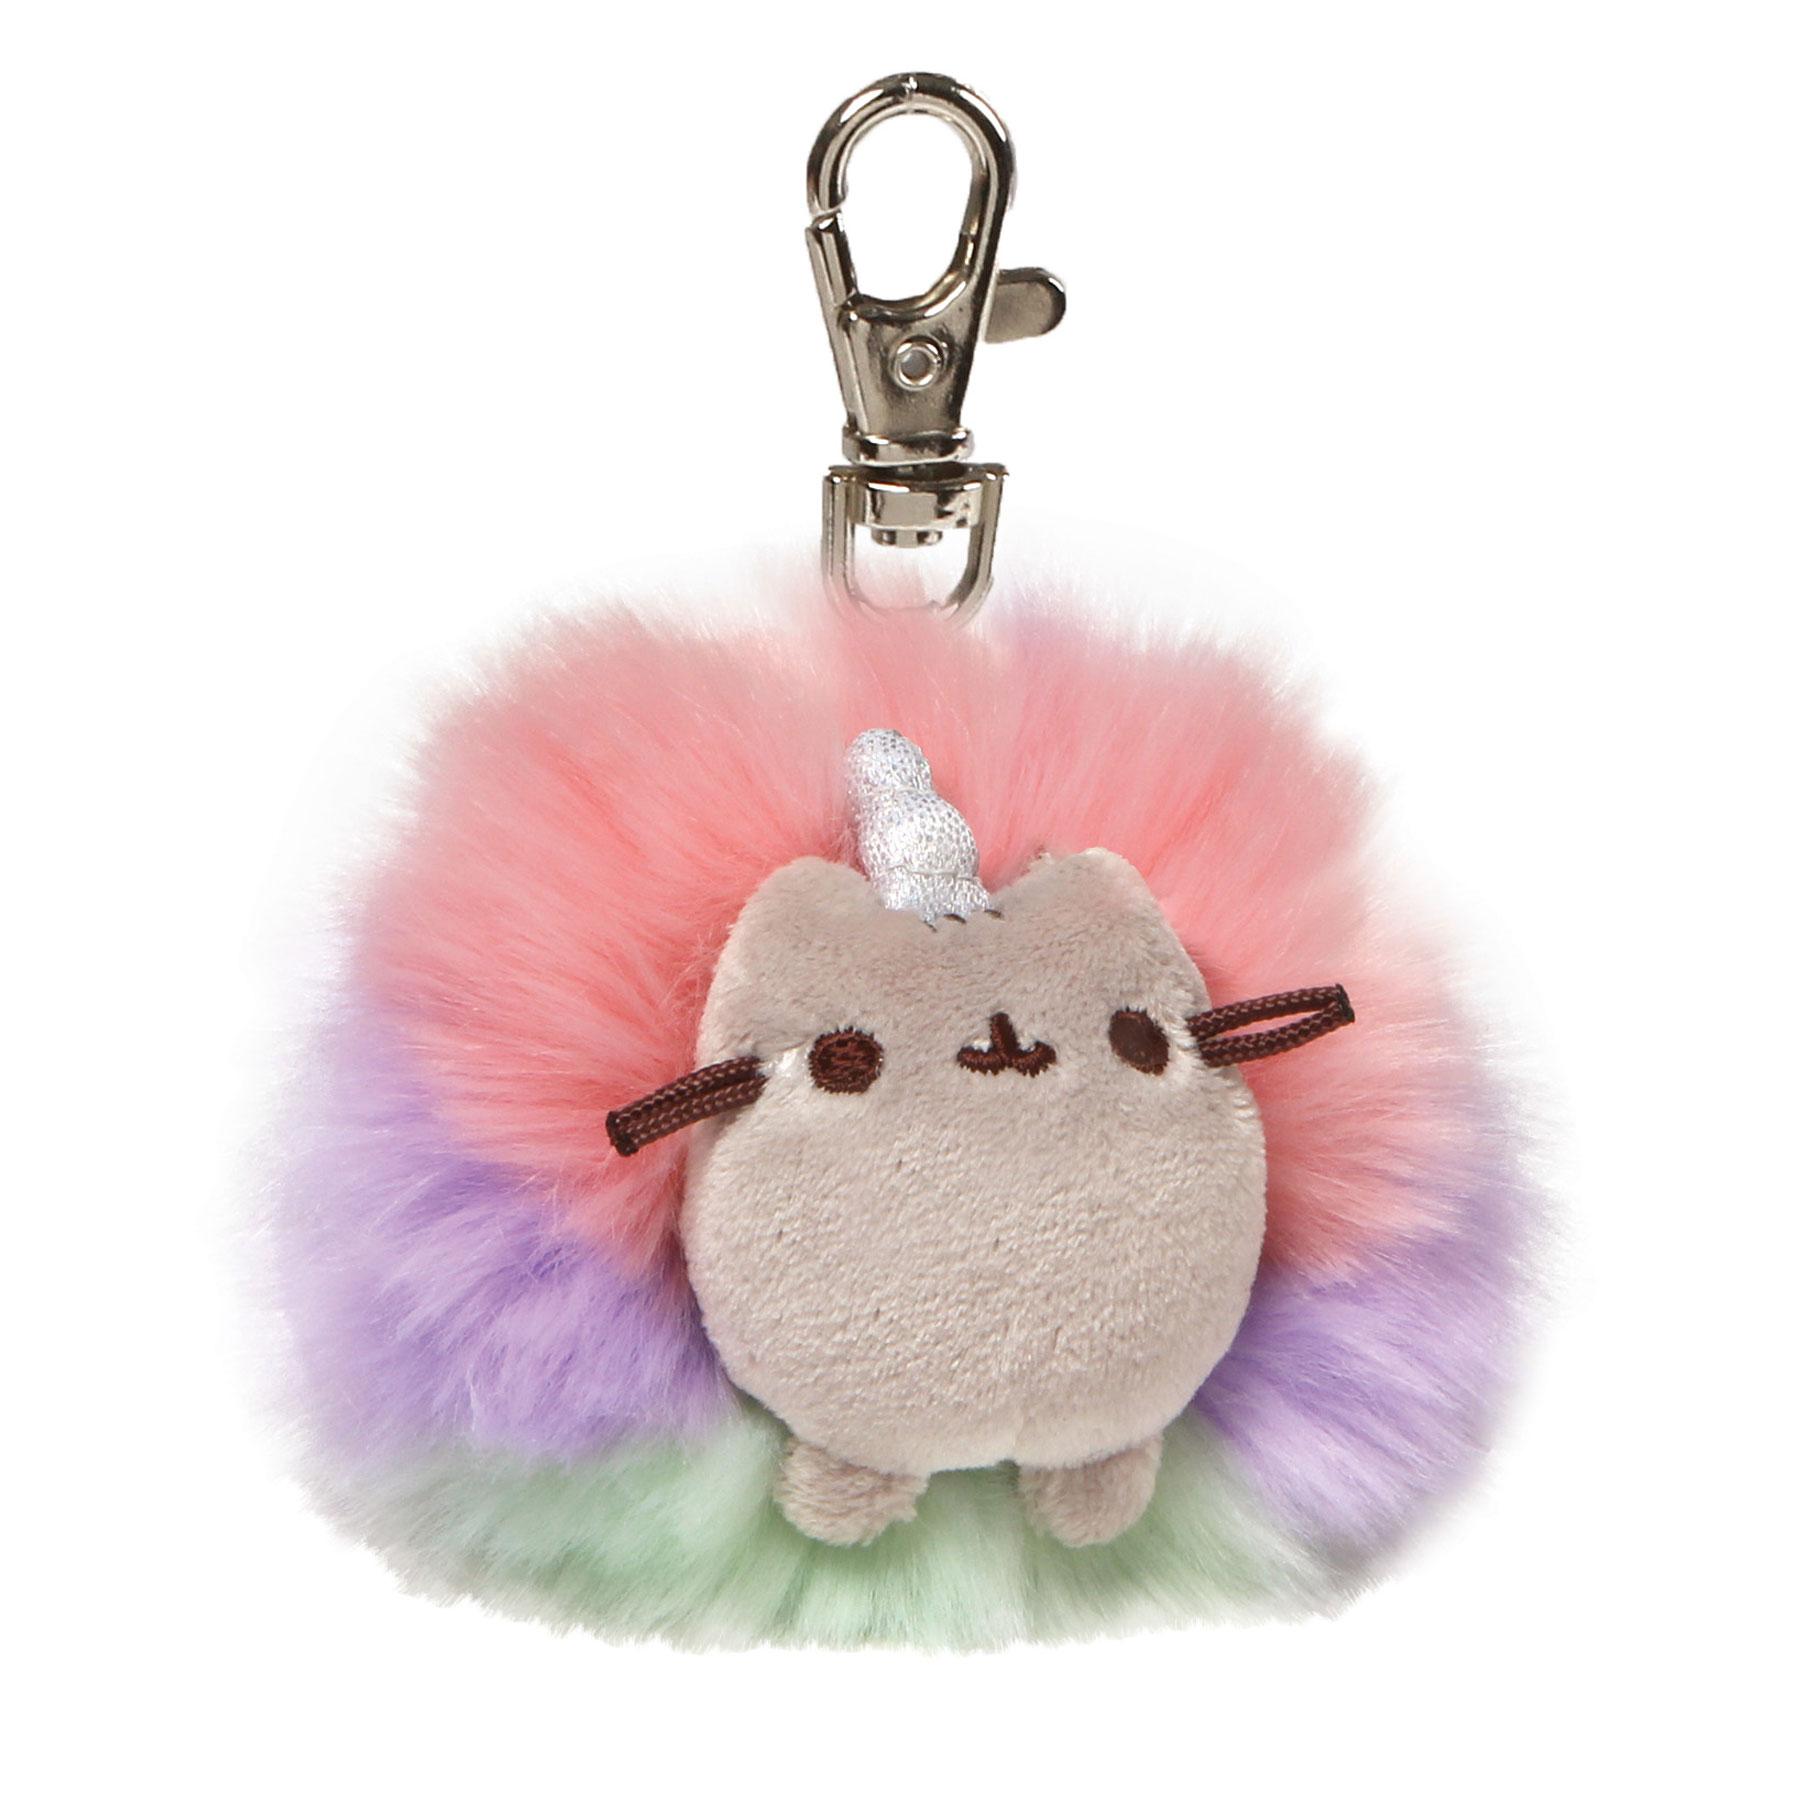 pusheen-poms-schlüsselanhänger-backpack-hanger-plüsch-plush-flauschig-anhänger-psuheenicorn-regenbogen-bunt